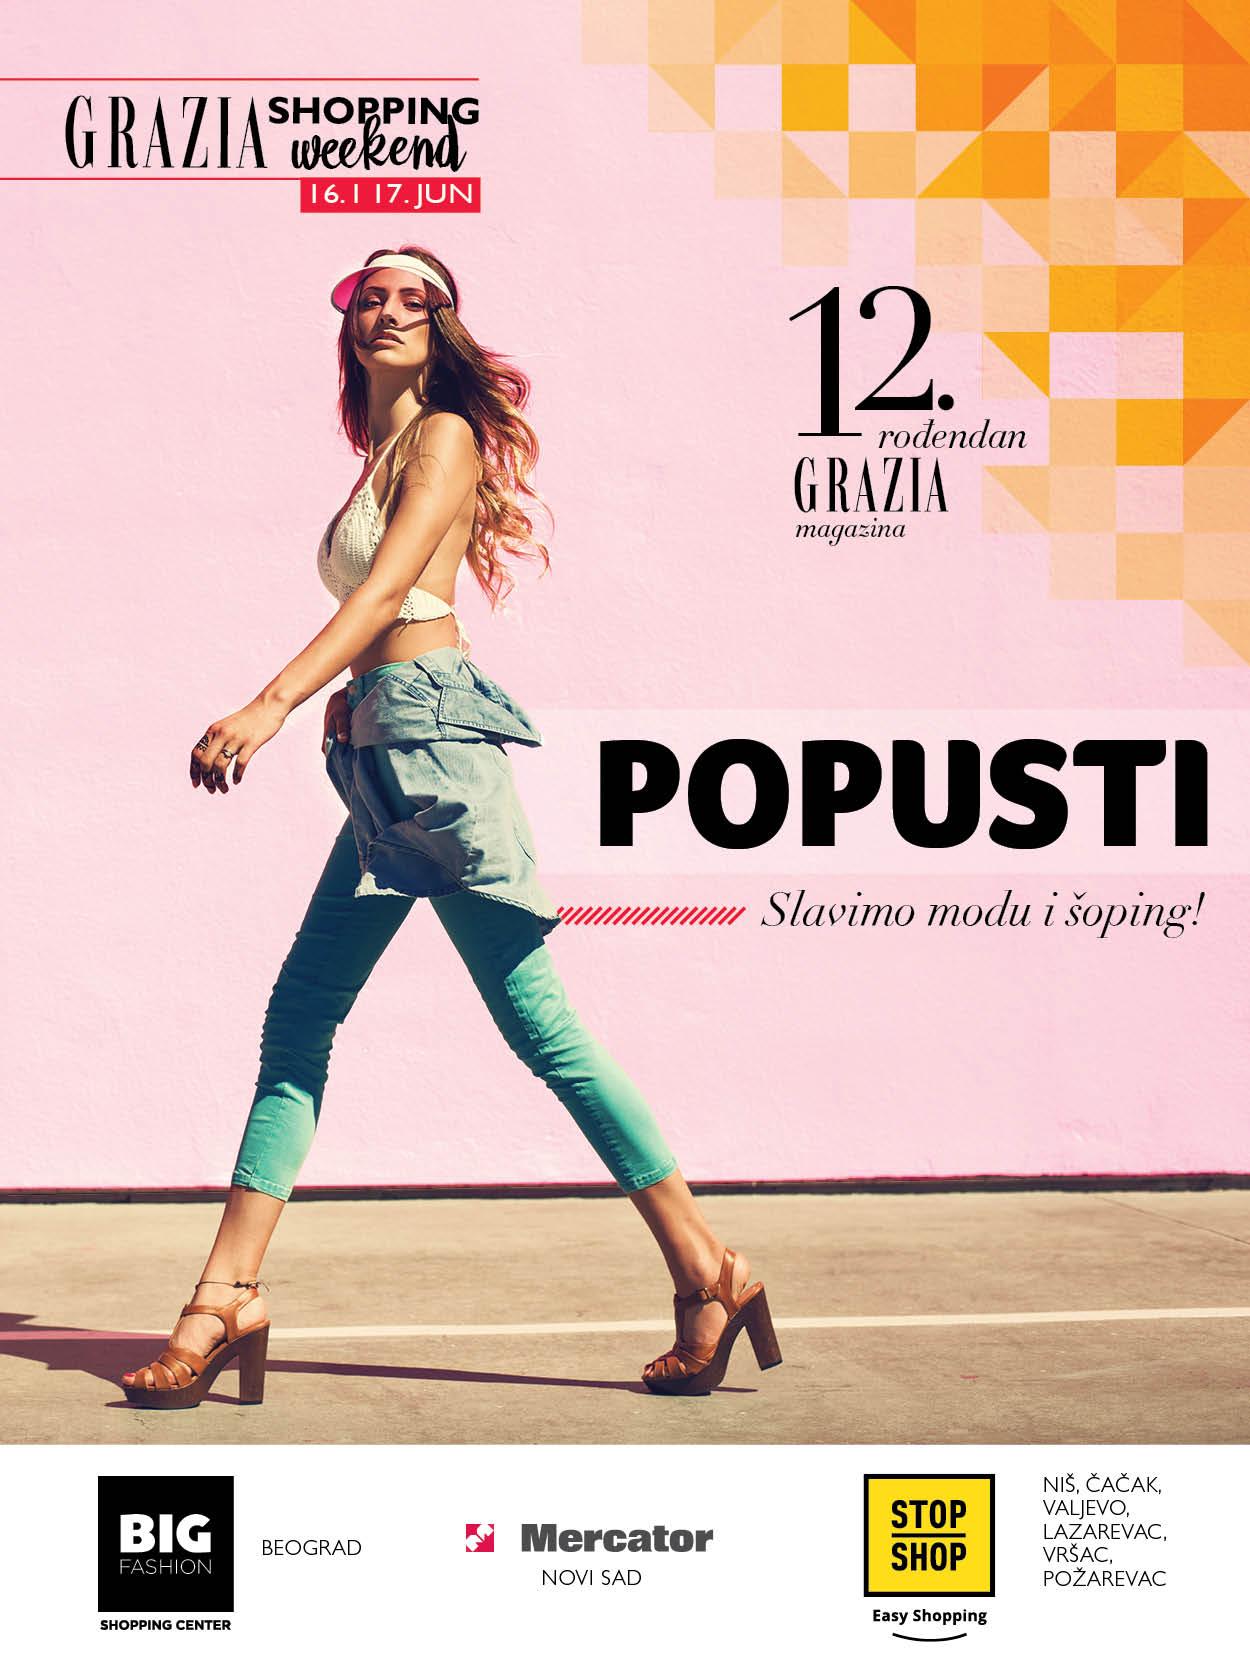 Grazia slavi 12. rođendan uz najveći Grazia Shopping Weekend!